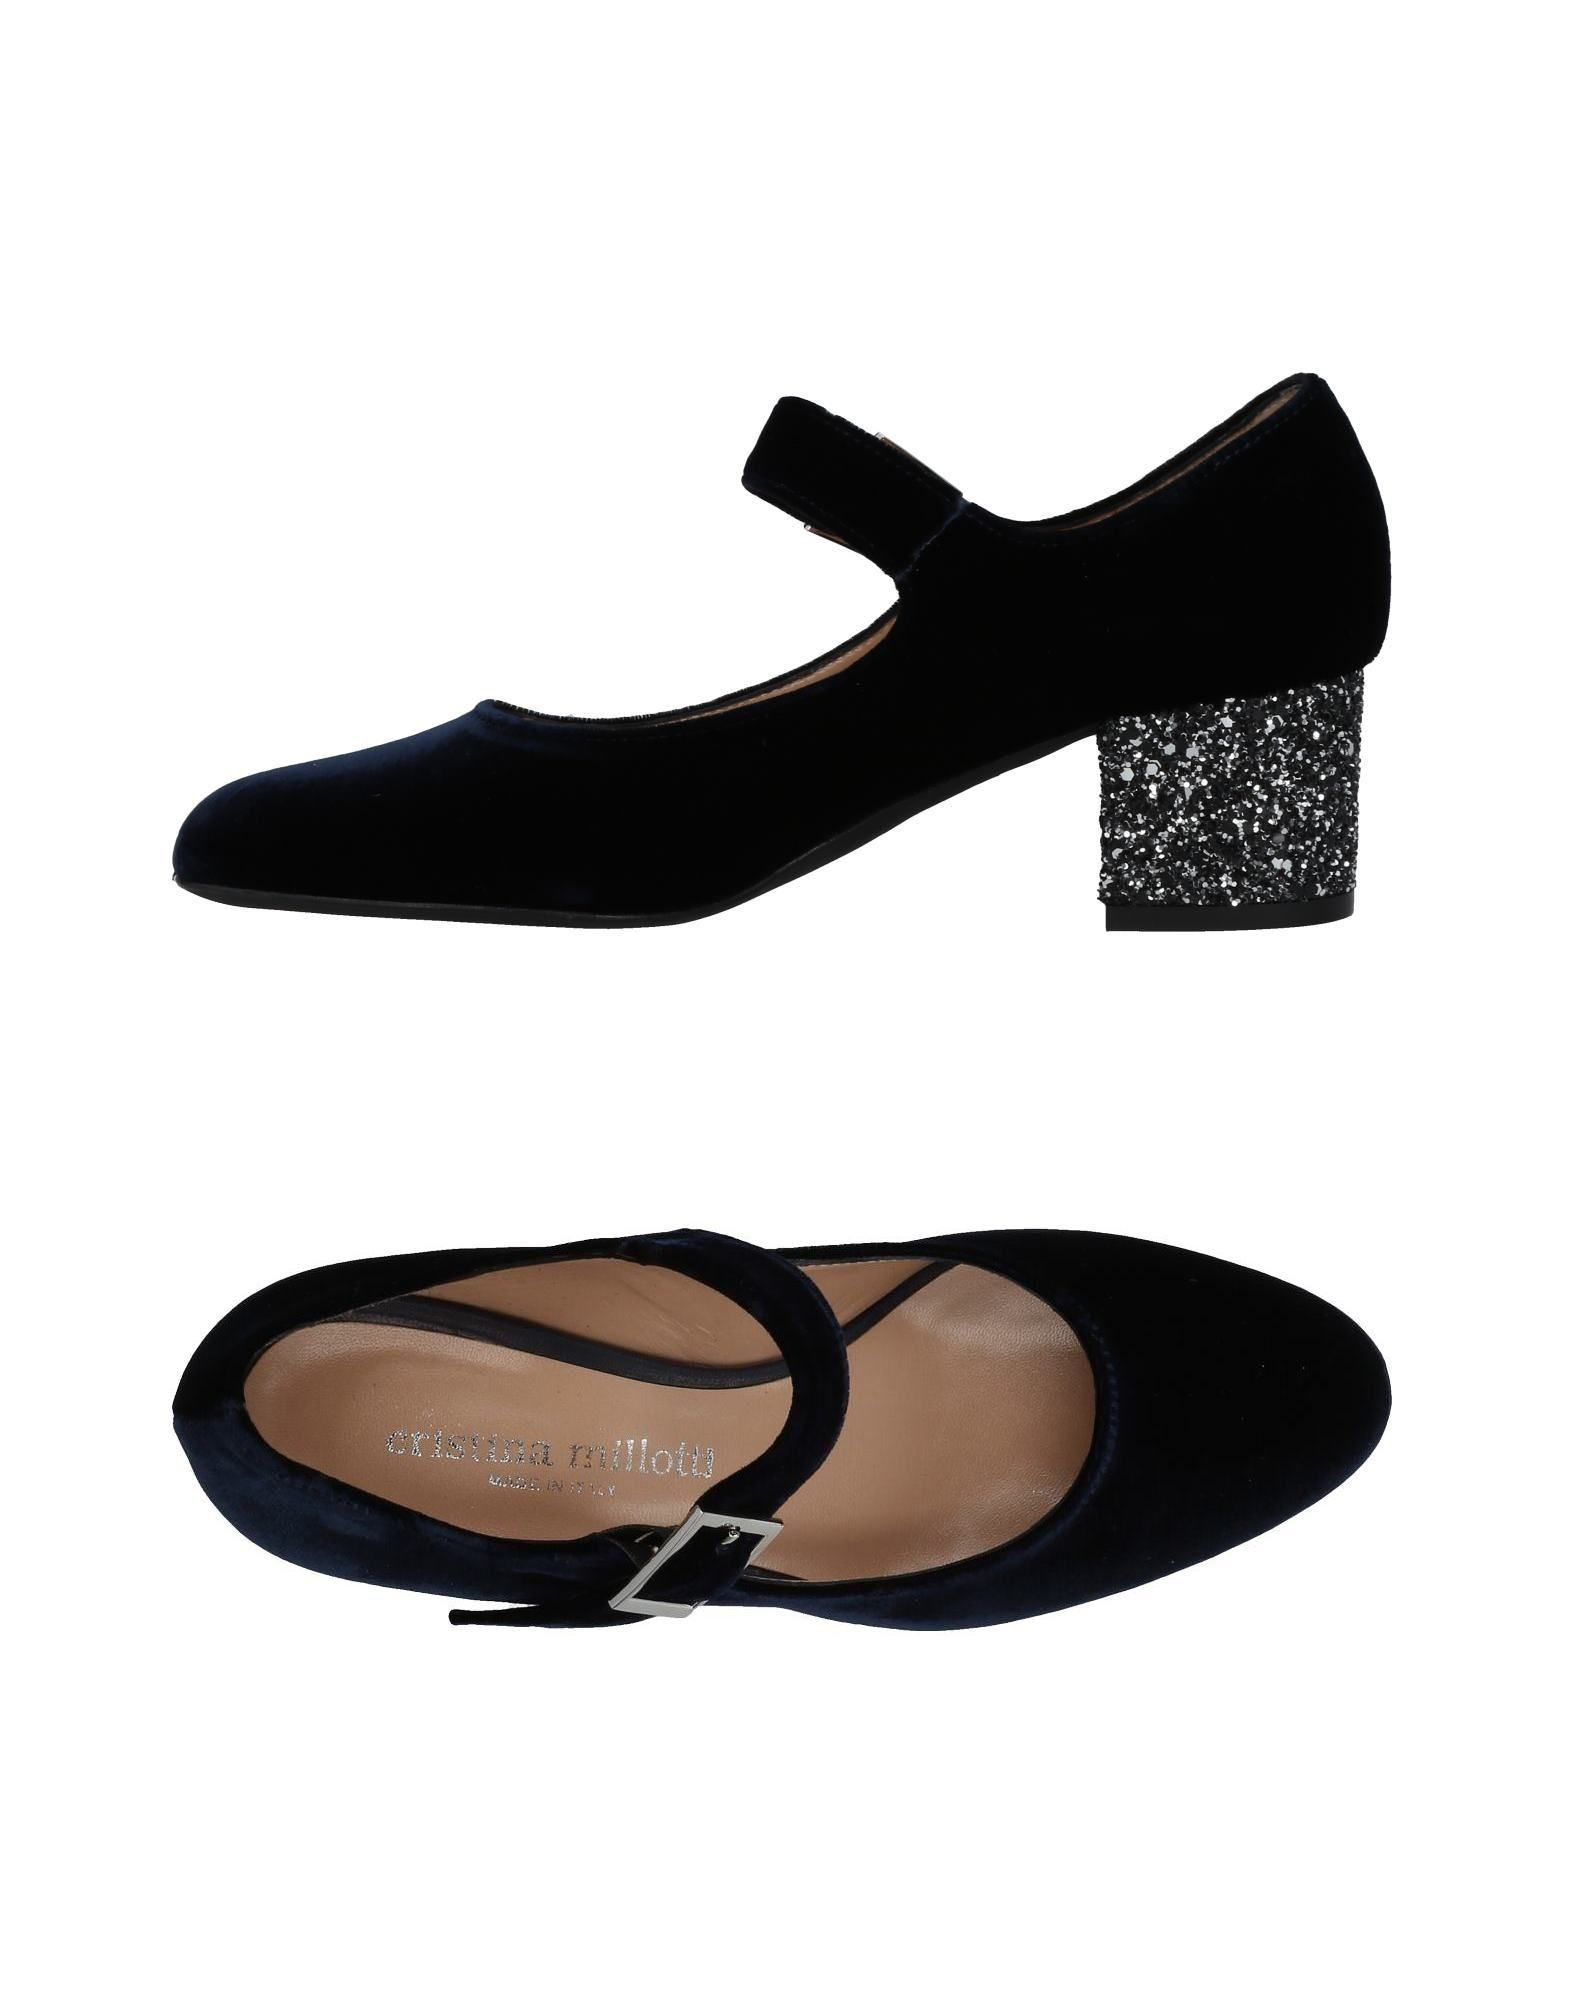 Cristina 11458057HG Millotti Pumps Damen  11458057HG Cristina Gute Qualität beliebte Schuhe b89fdd